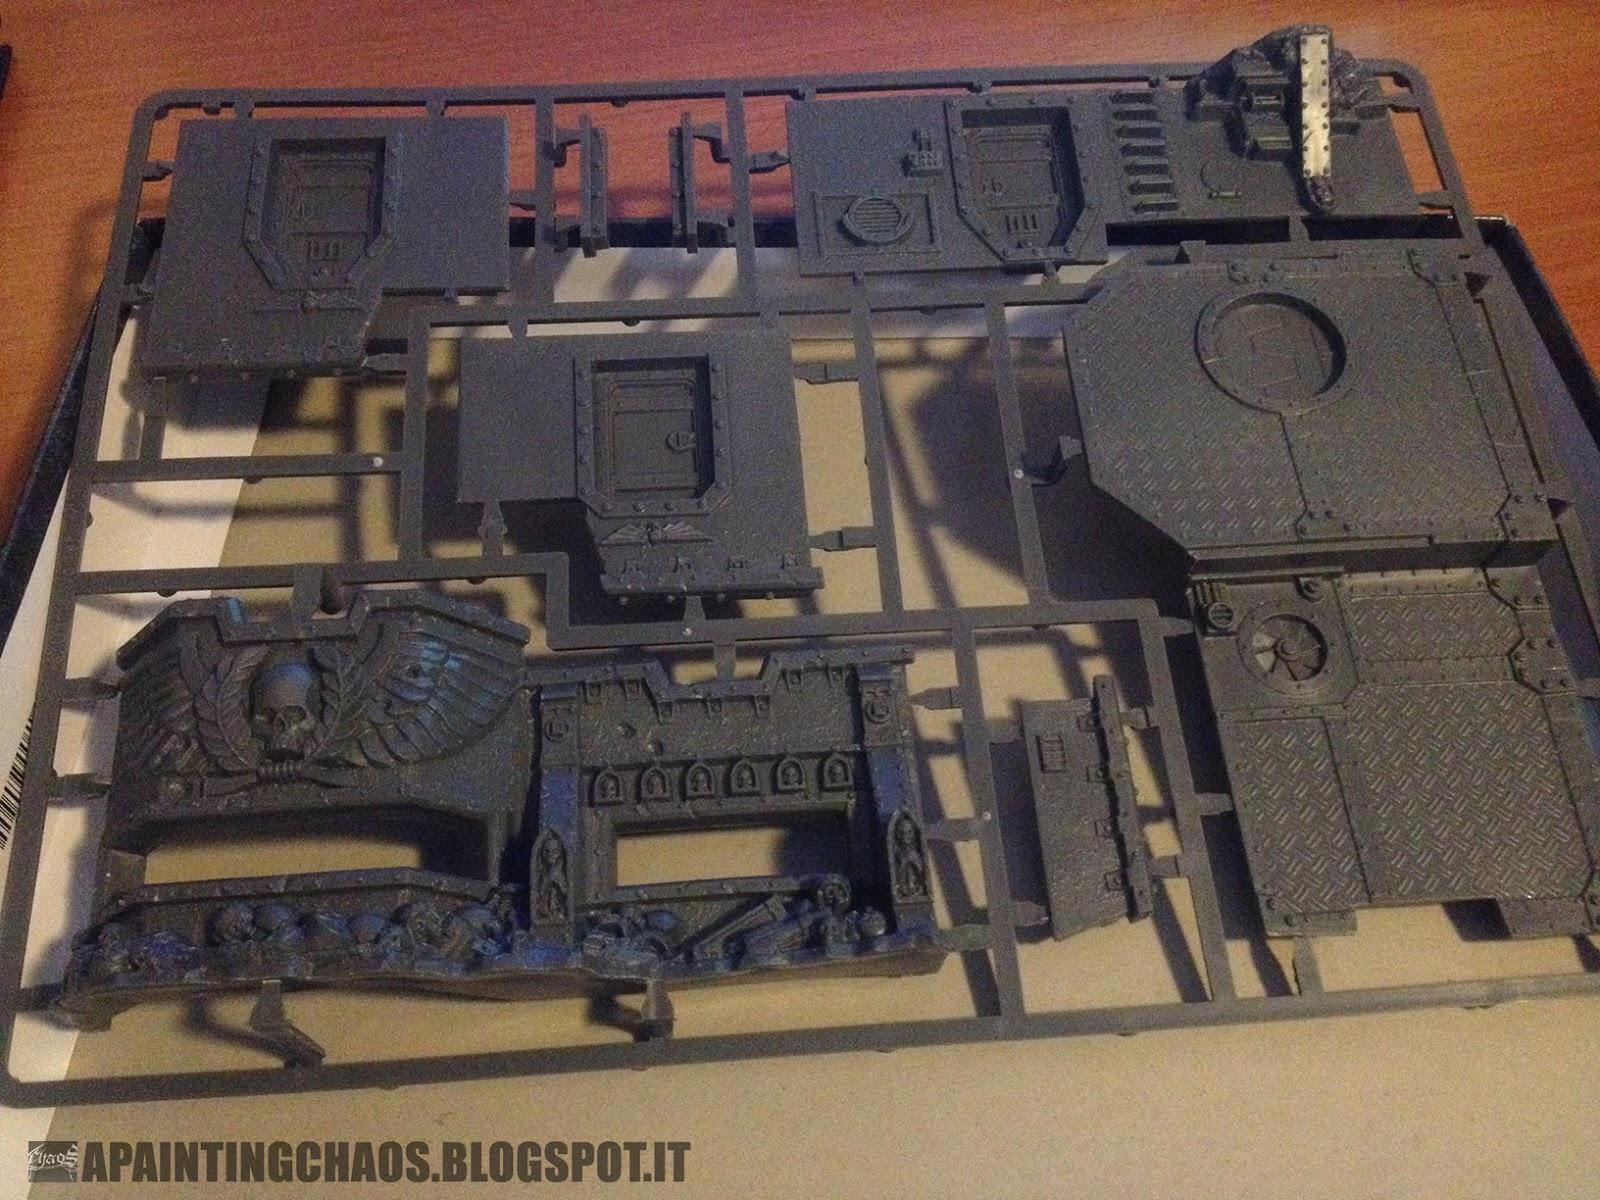 http://3.bp.blogspot.com/--0LHHYiYUoI/UL9BWJrPZjI/AAAAAAAAAOg/ULlyGOQEIX8/s1600/Wall+of+Martyrs+Imperial+Bunker+box+content.jpg